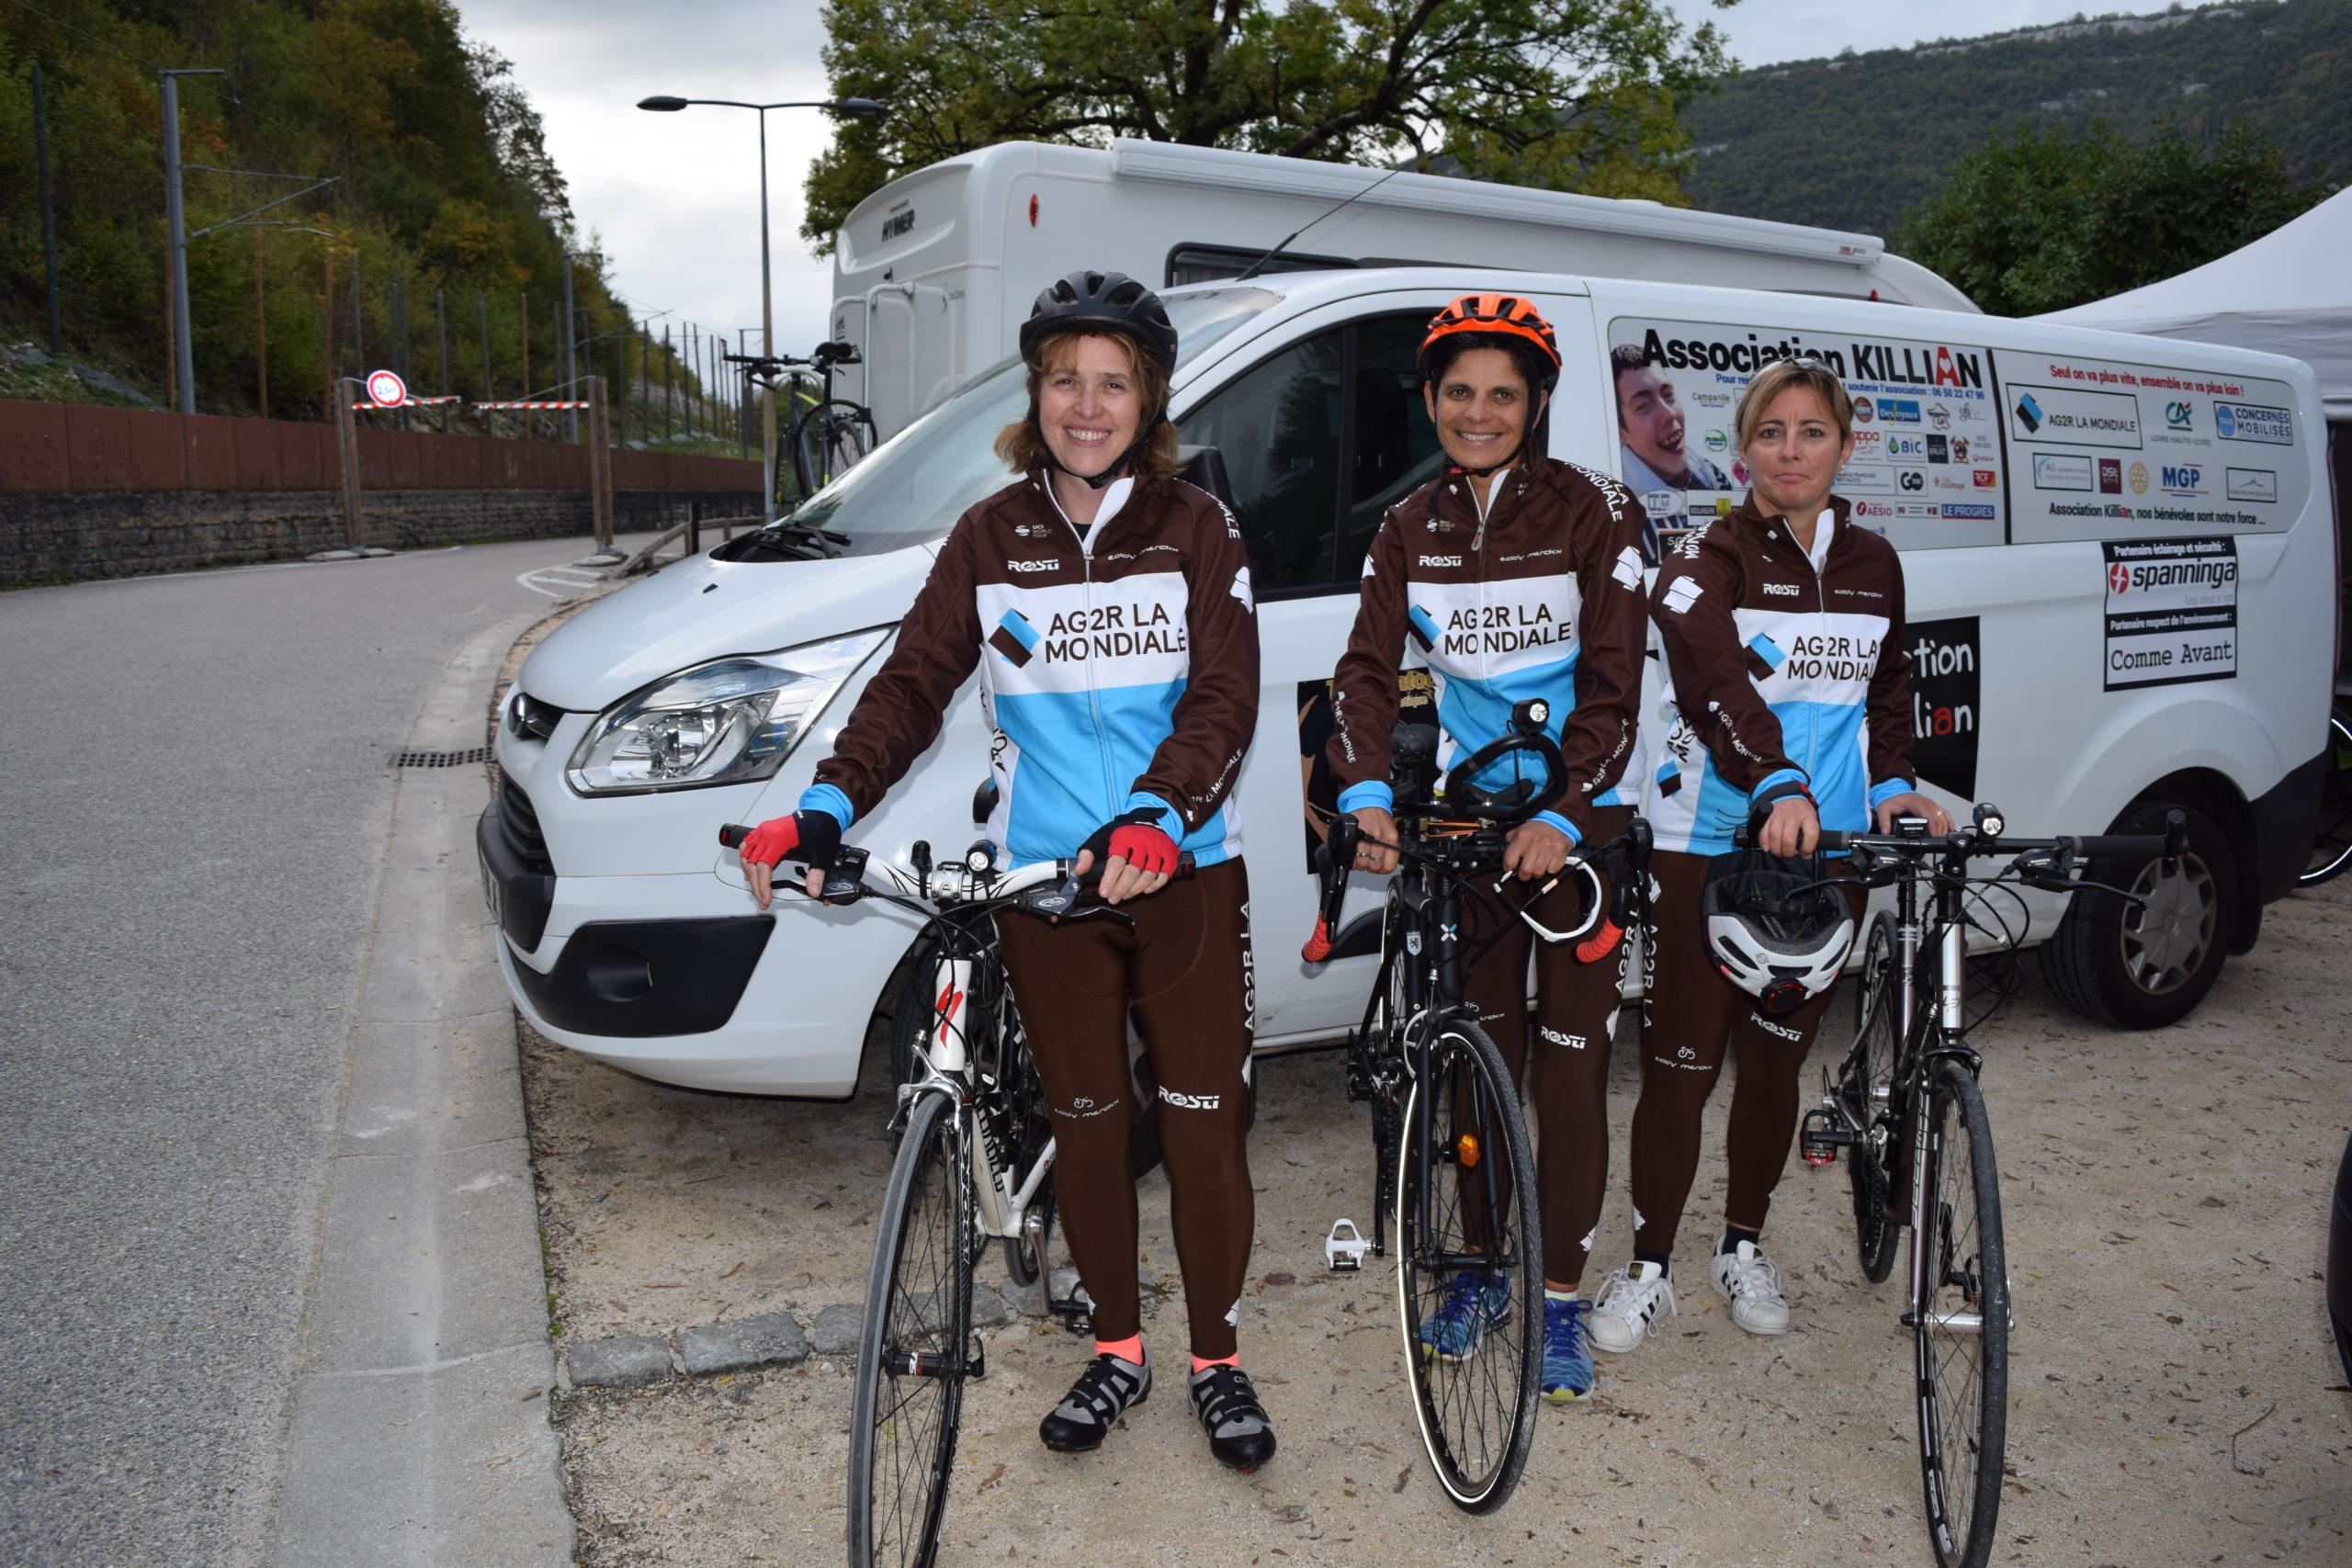 Spanninga Bicycle Lights Together with ASSOCIATION KILLIAN Non classé